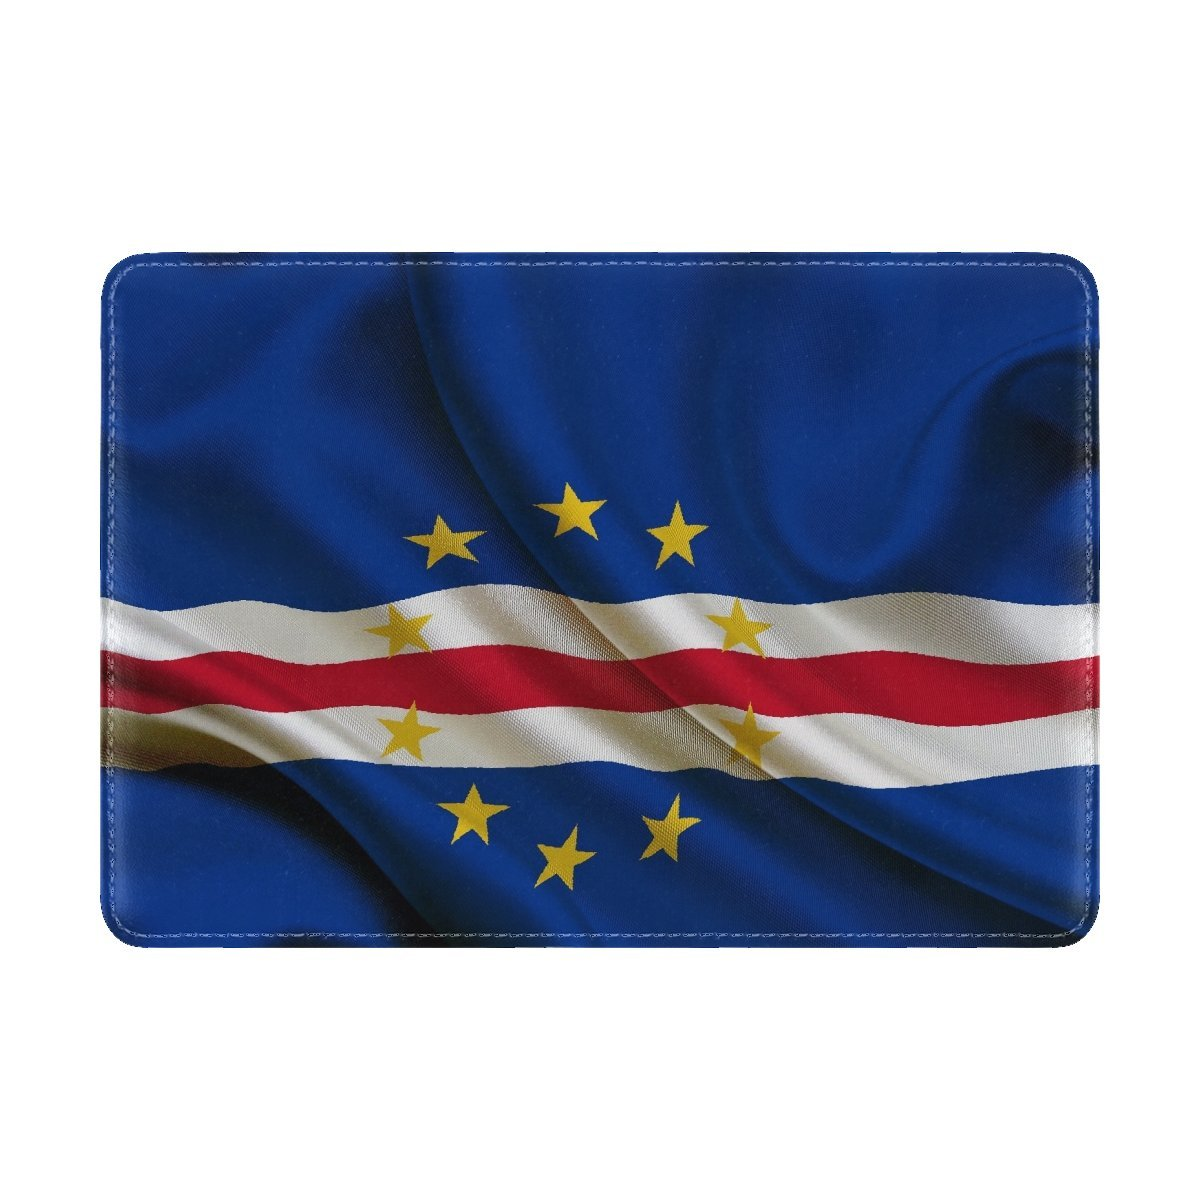 National Flag Republic Cape Verde Leather Passport Holder Cover Case Travel One Pocket by Fenda (Image #3)